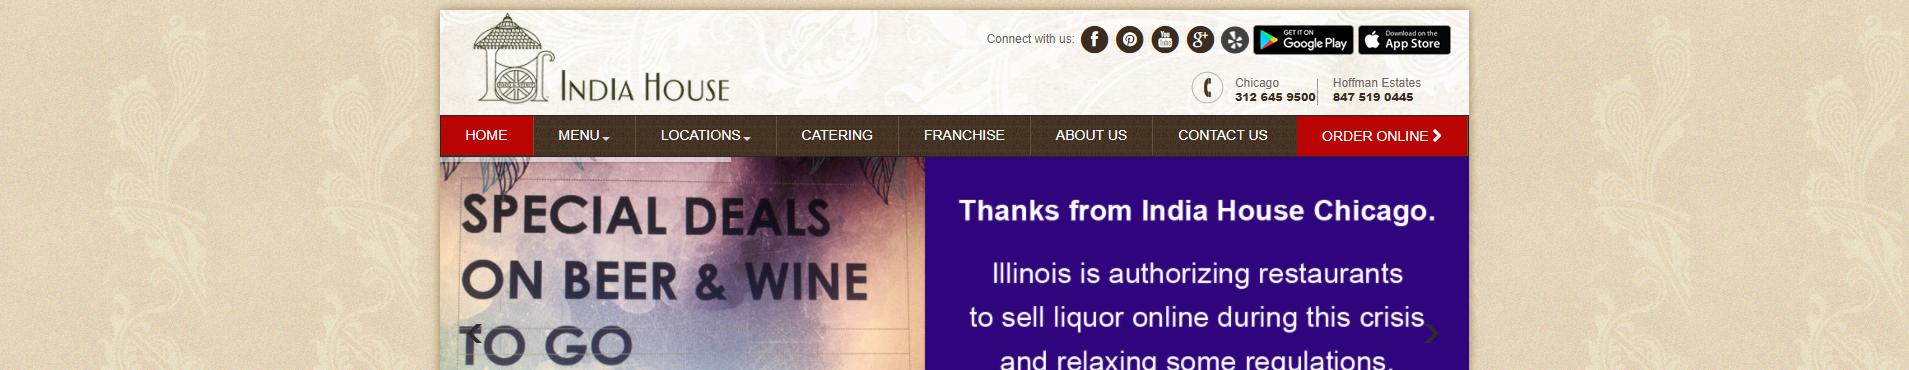 5 Best Indian Restaurants in Chicago4